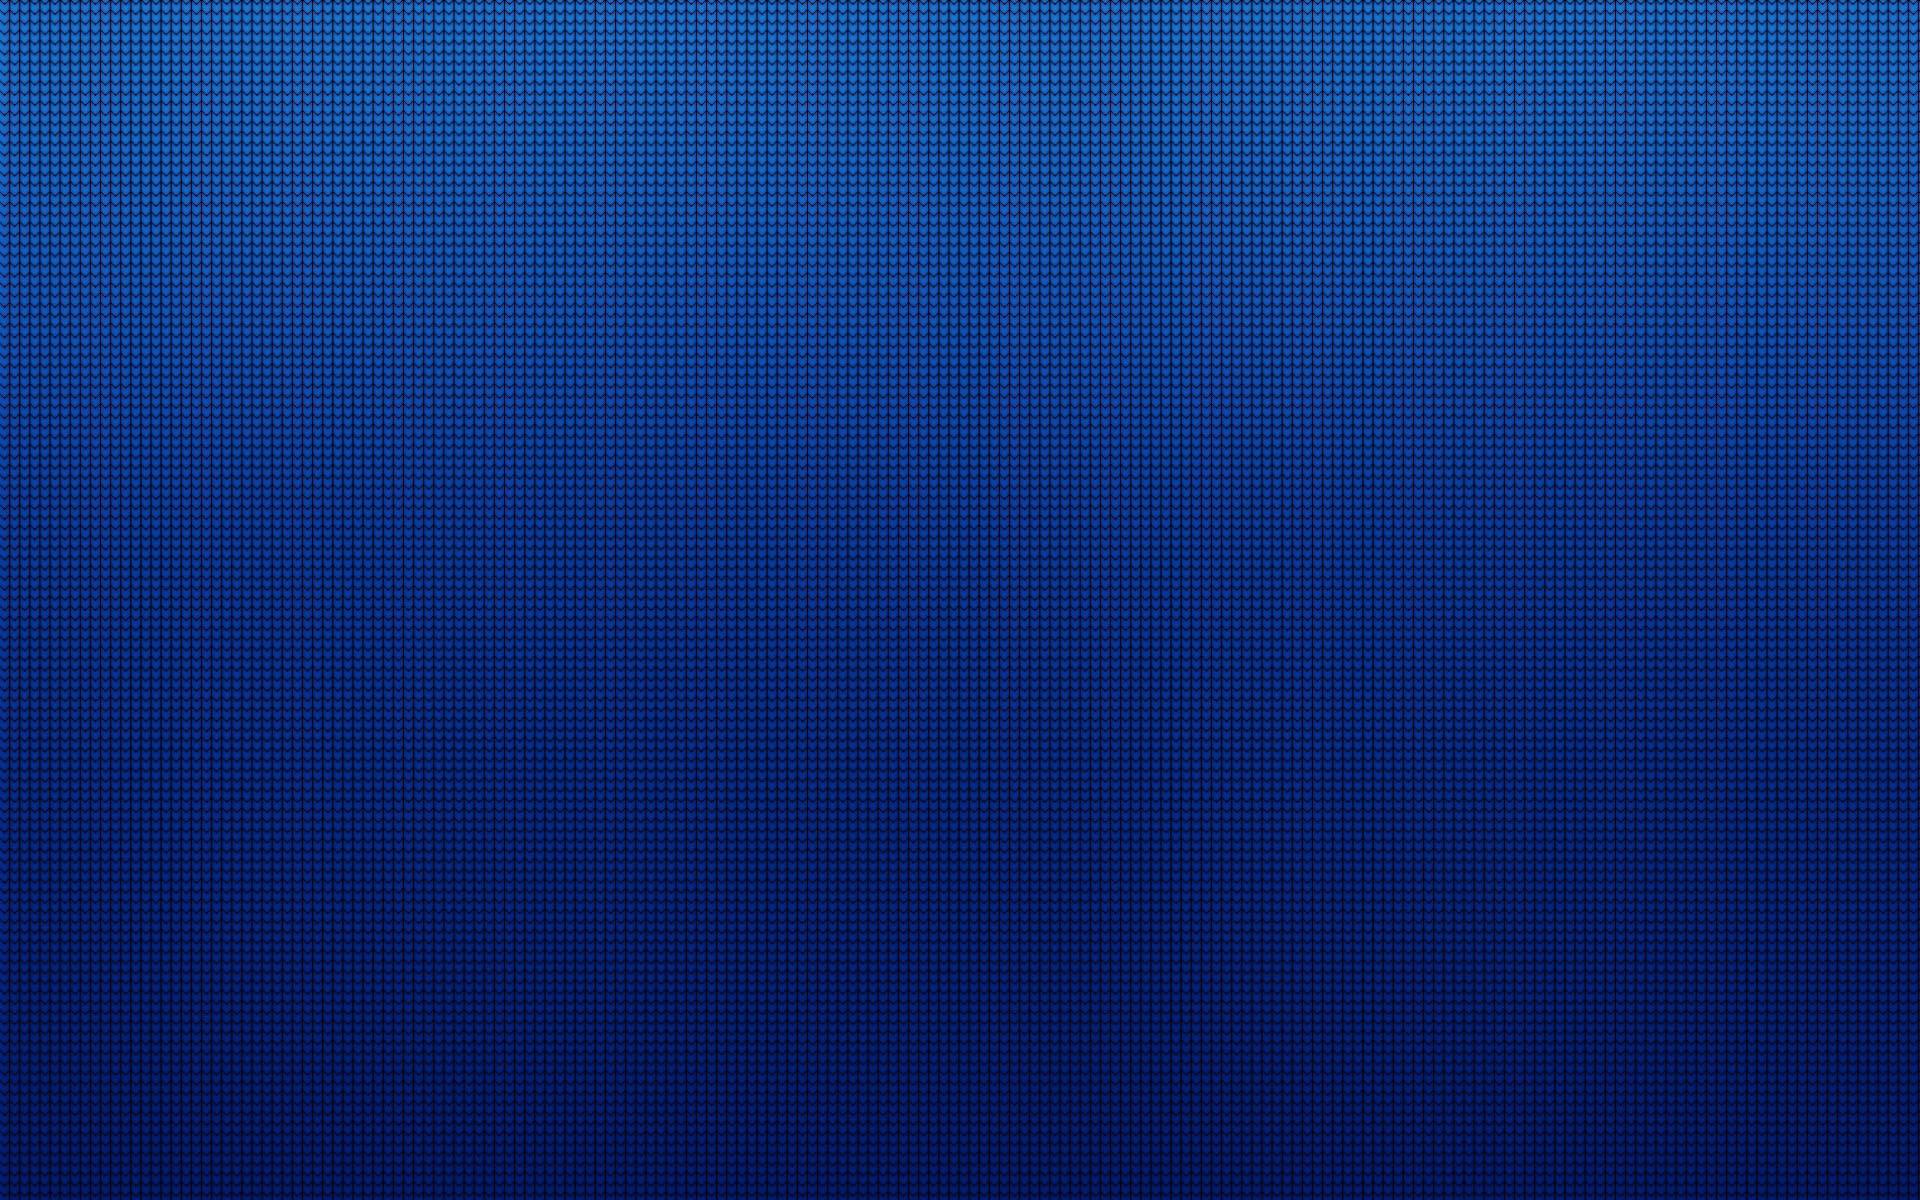 Plain Blue Background Wallpaper